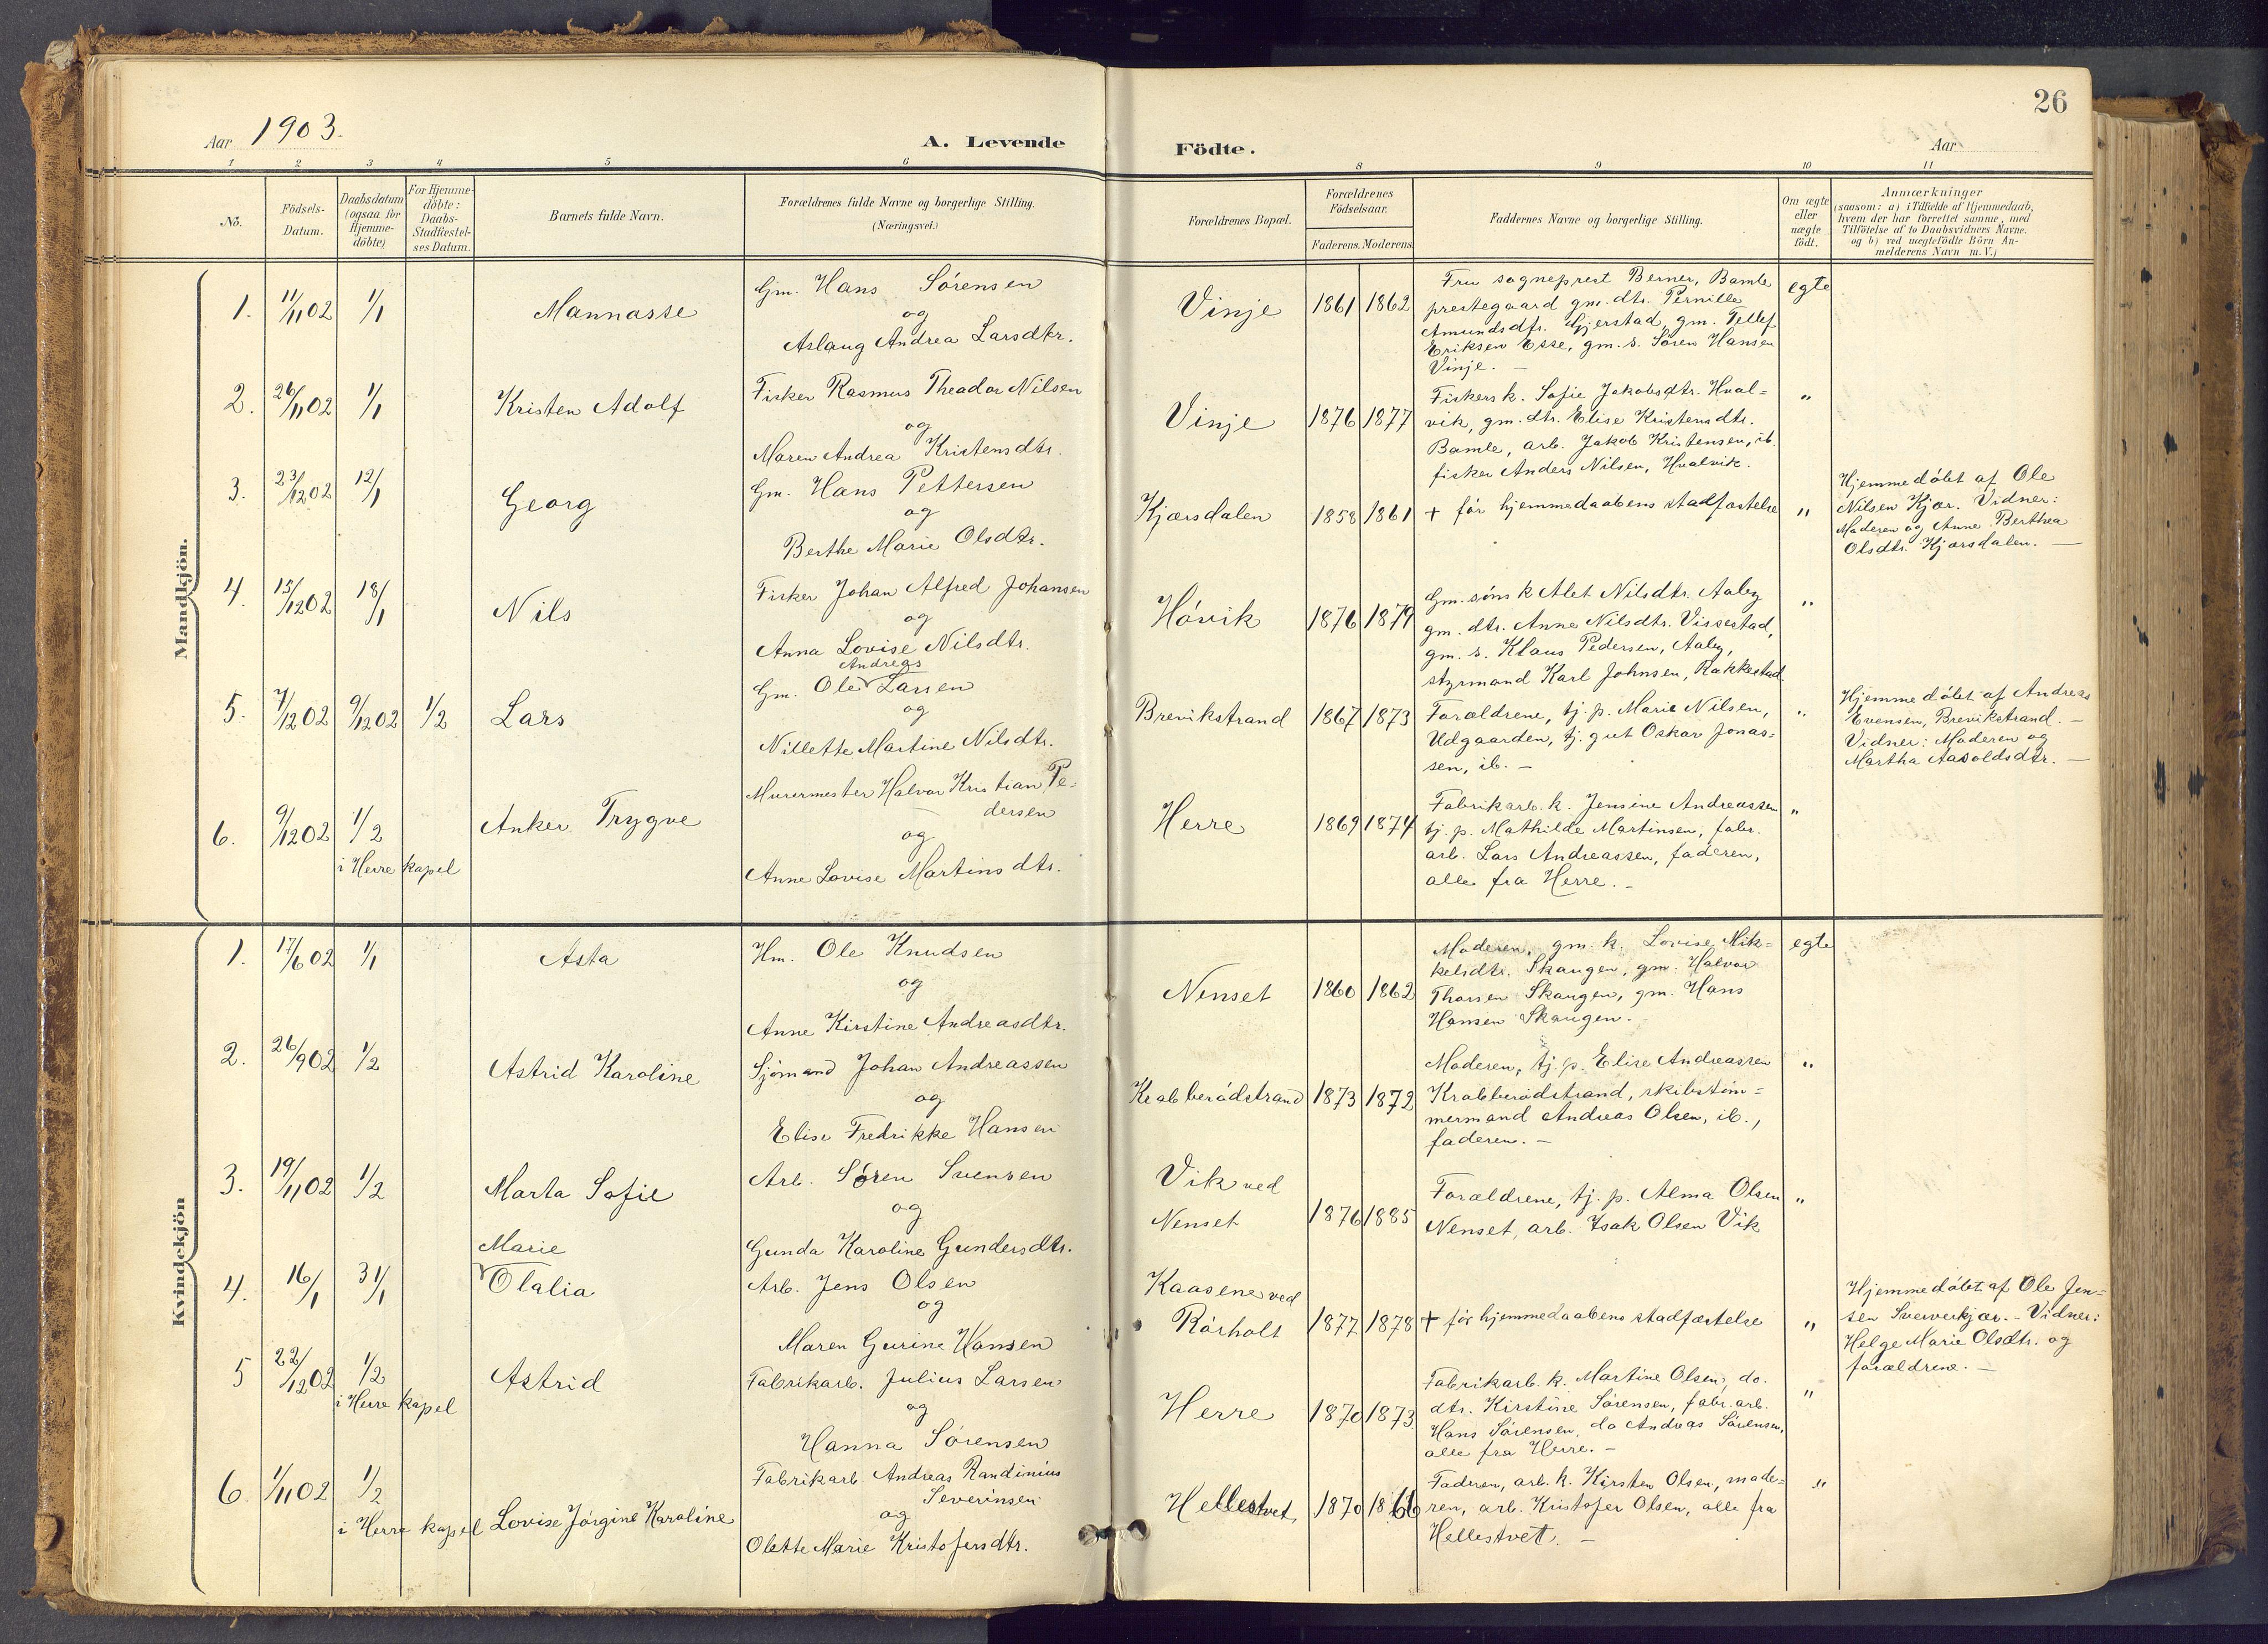 SAKO, Bamble kirkebøker, F/Fa/L0009: Ministerialbok nr. I 9, 1901-1917, s. 26